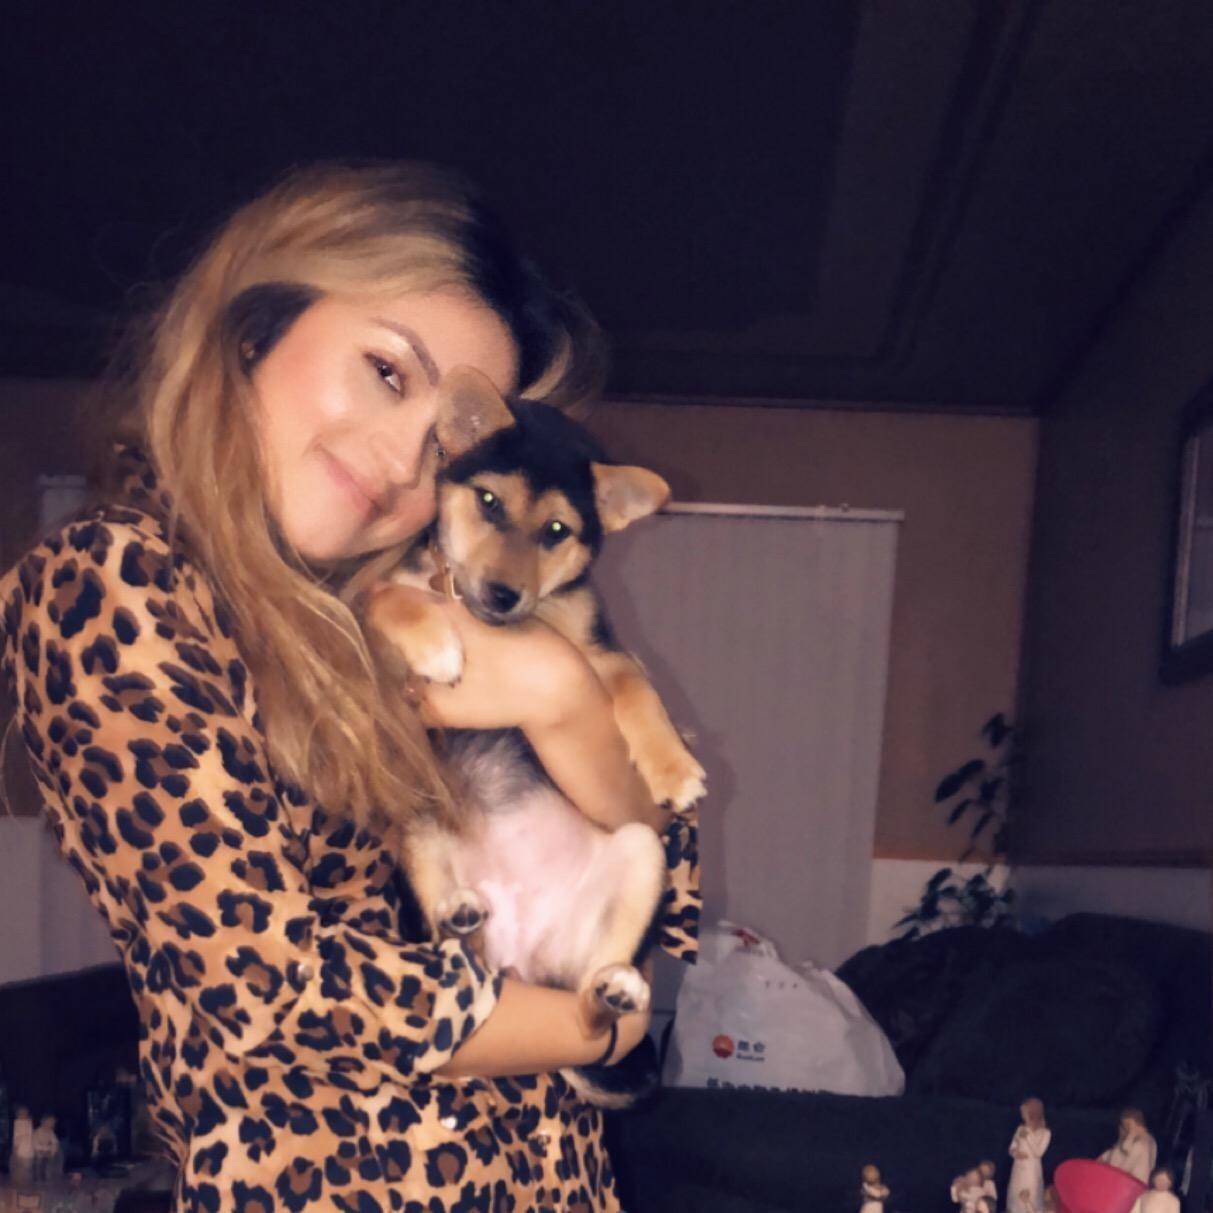 Reina's dog day care